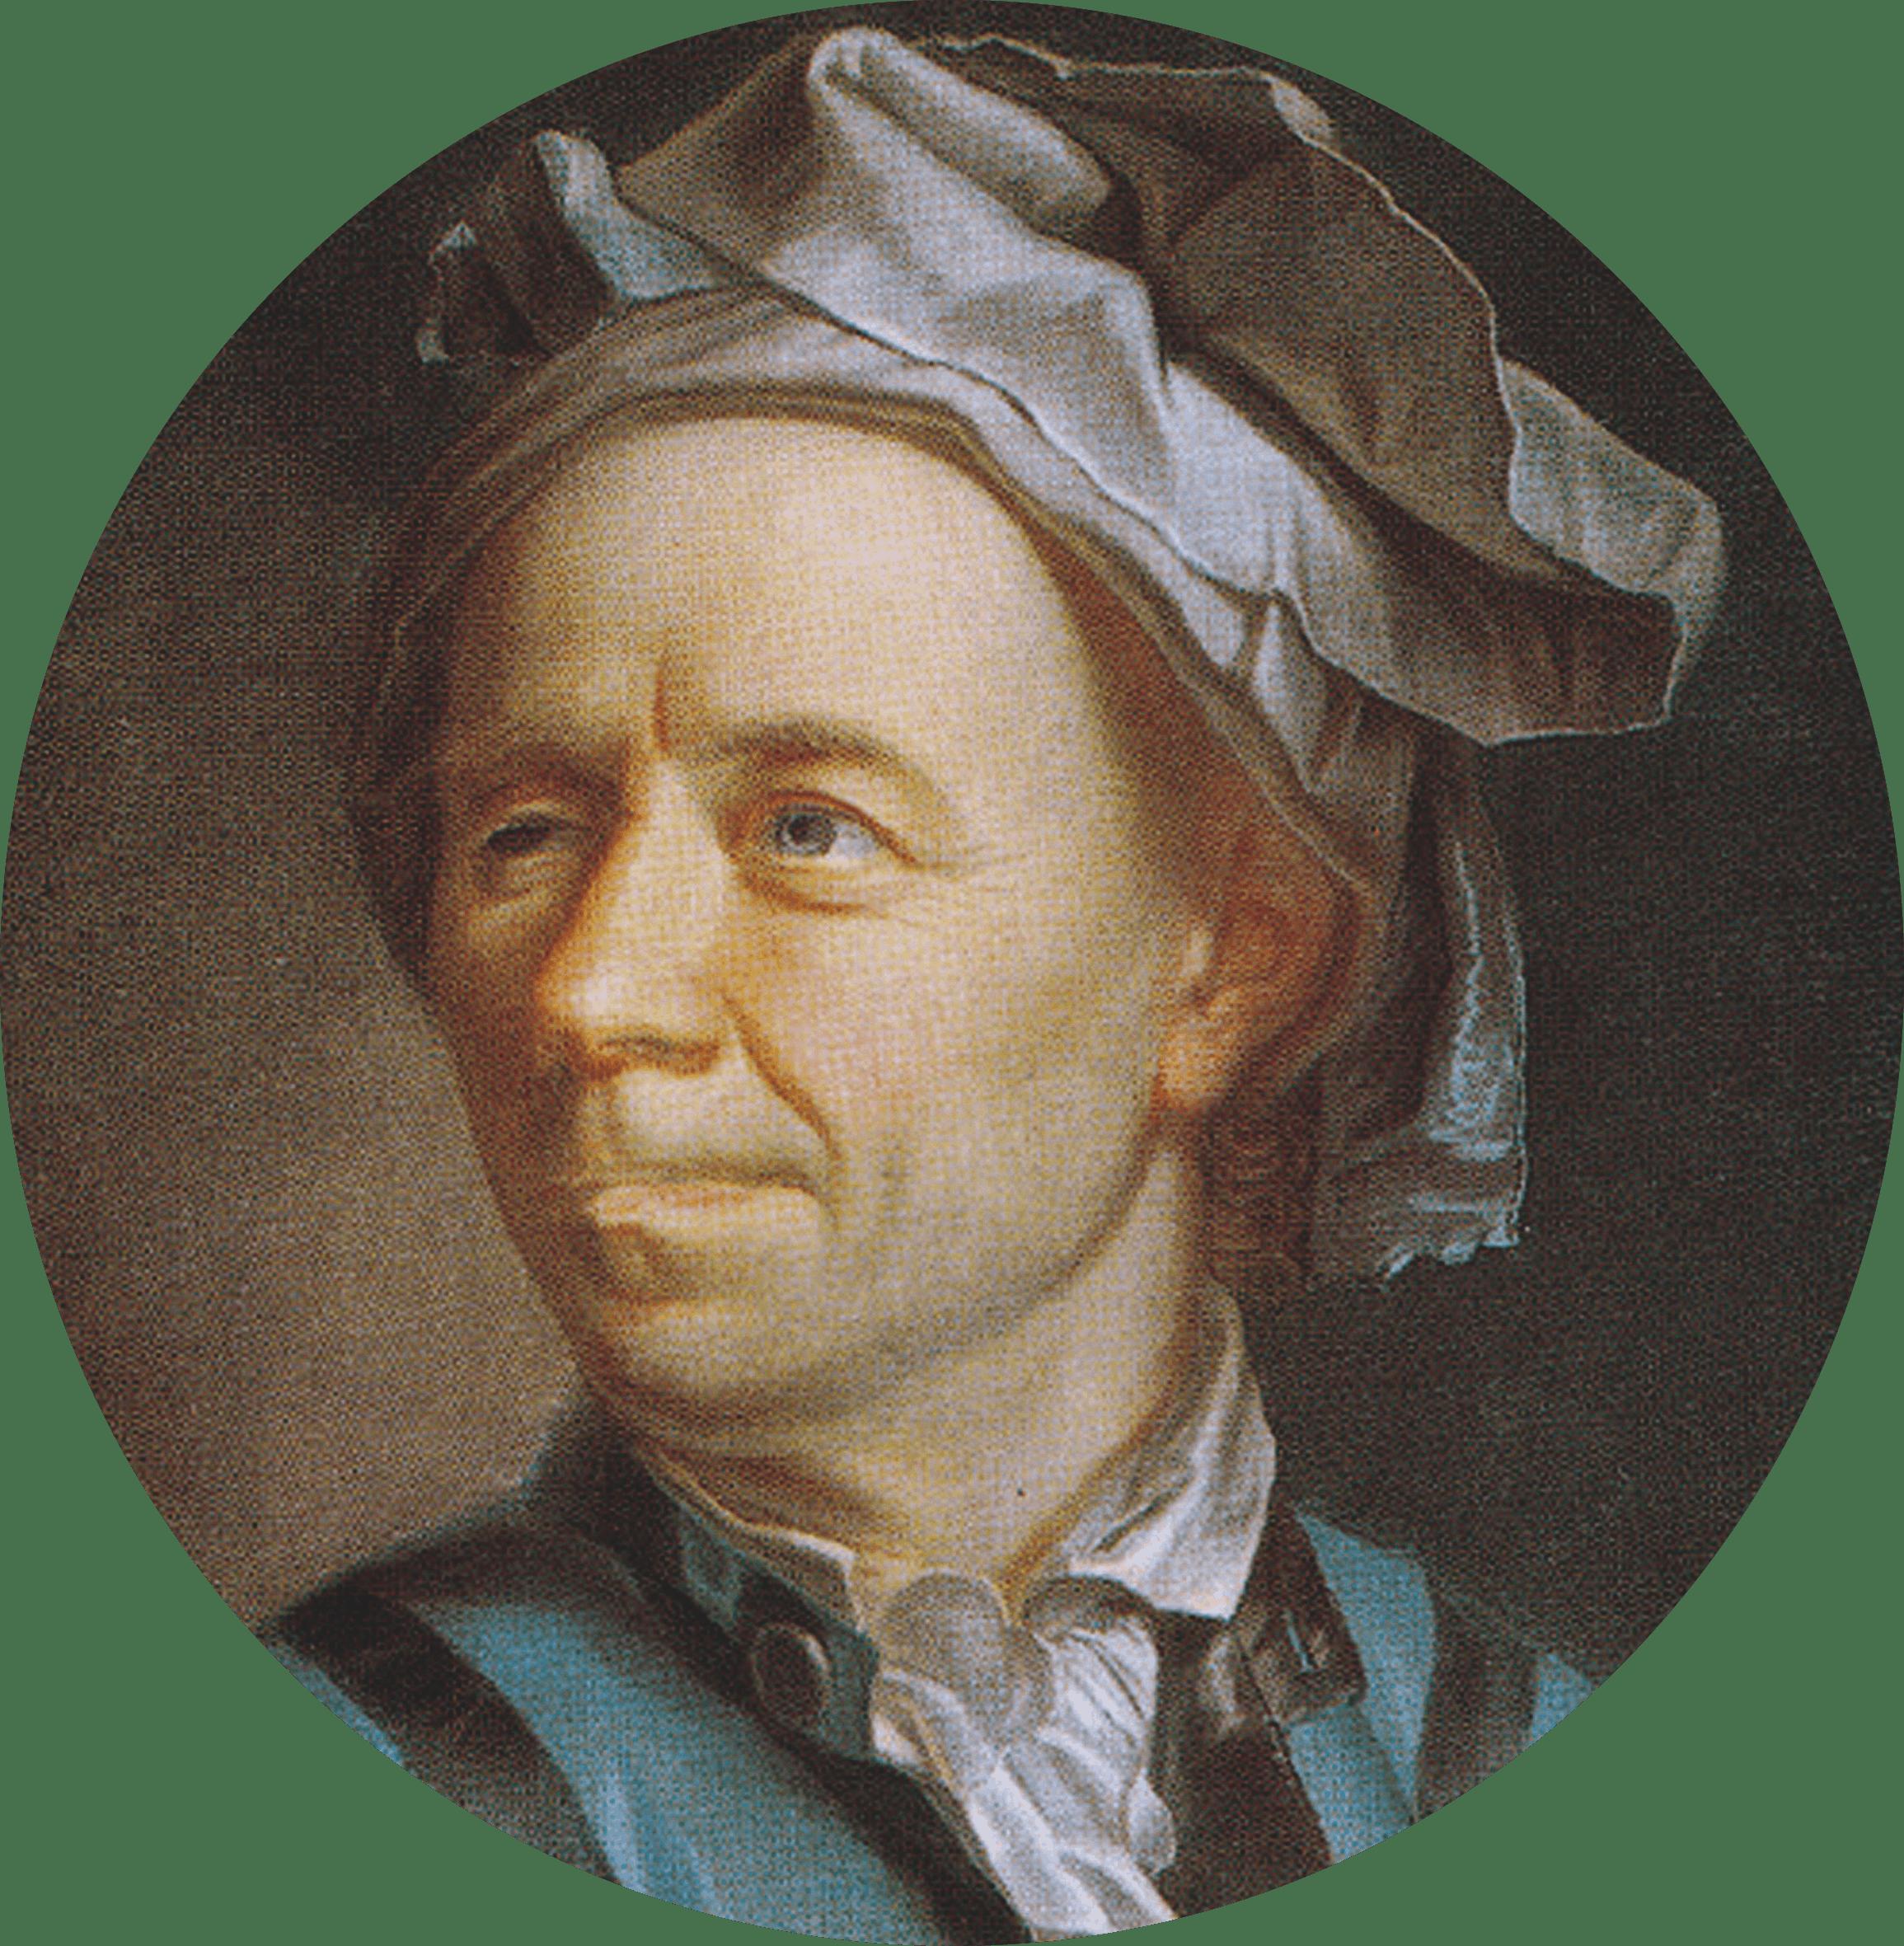 Portrait de Leonhard Euler